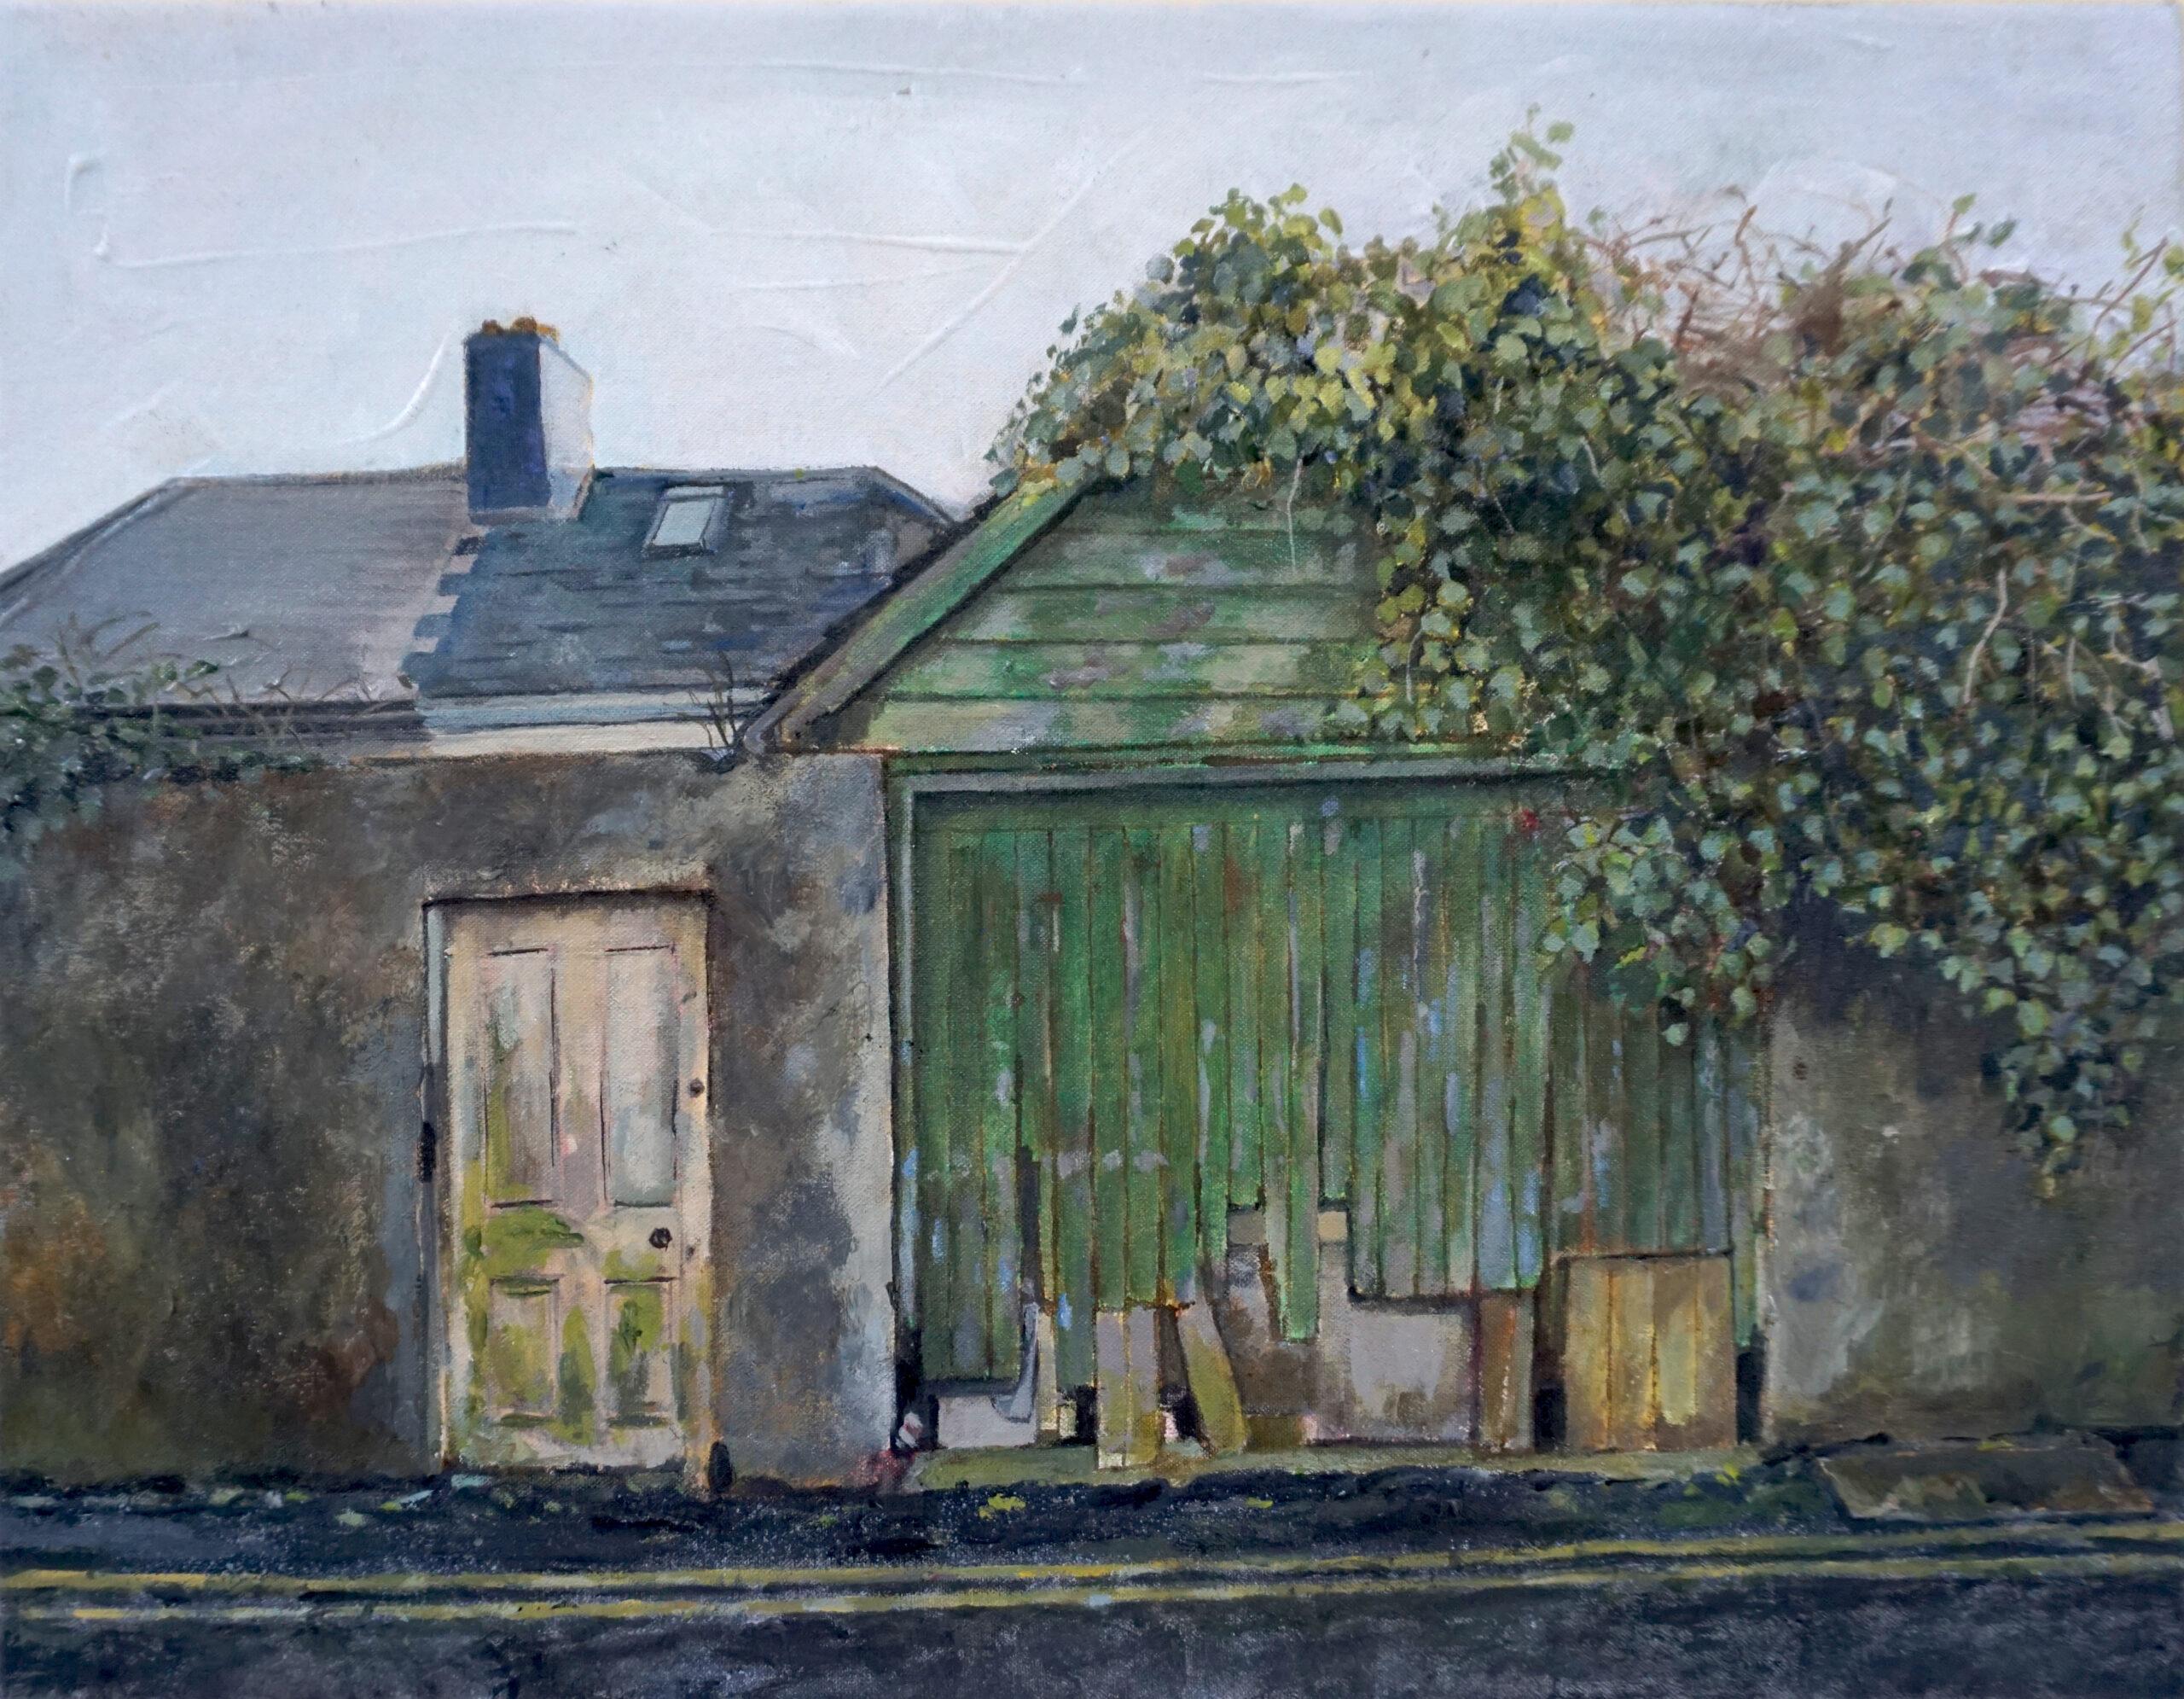 paul-mc-kenna-garage-alexandra-rd.acrylic-on-canvas-35x45cm